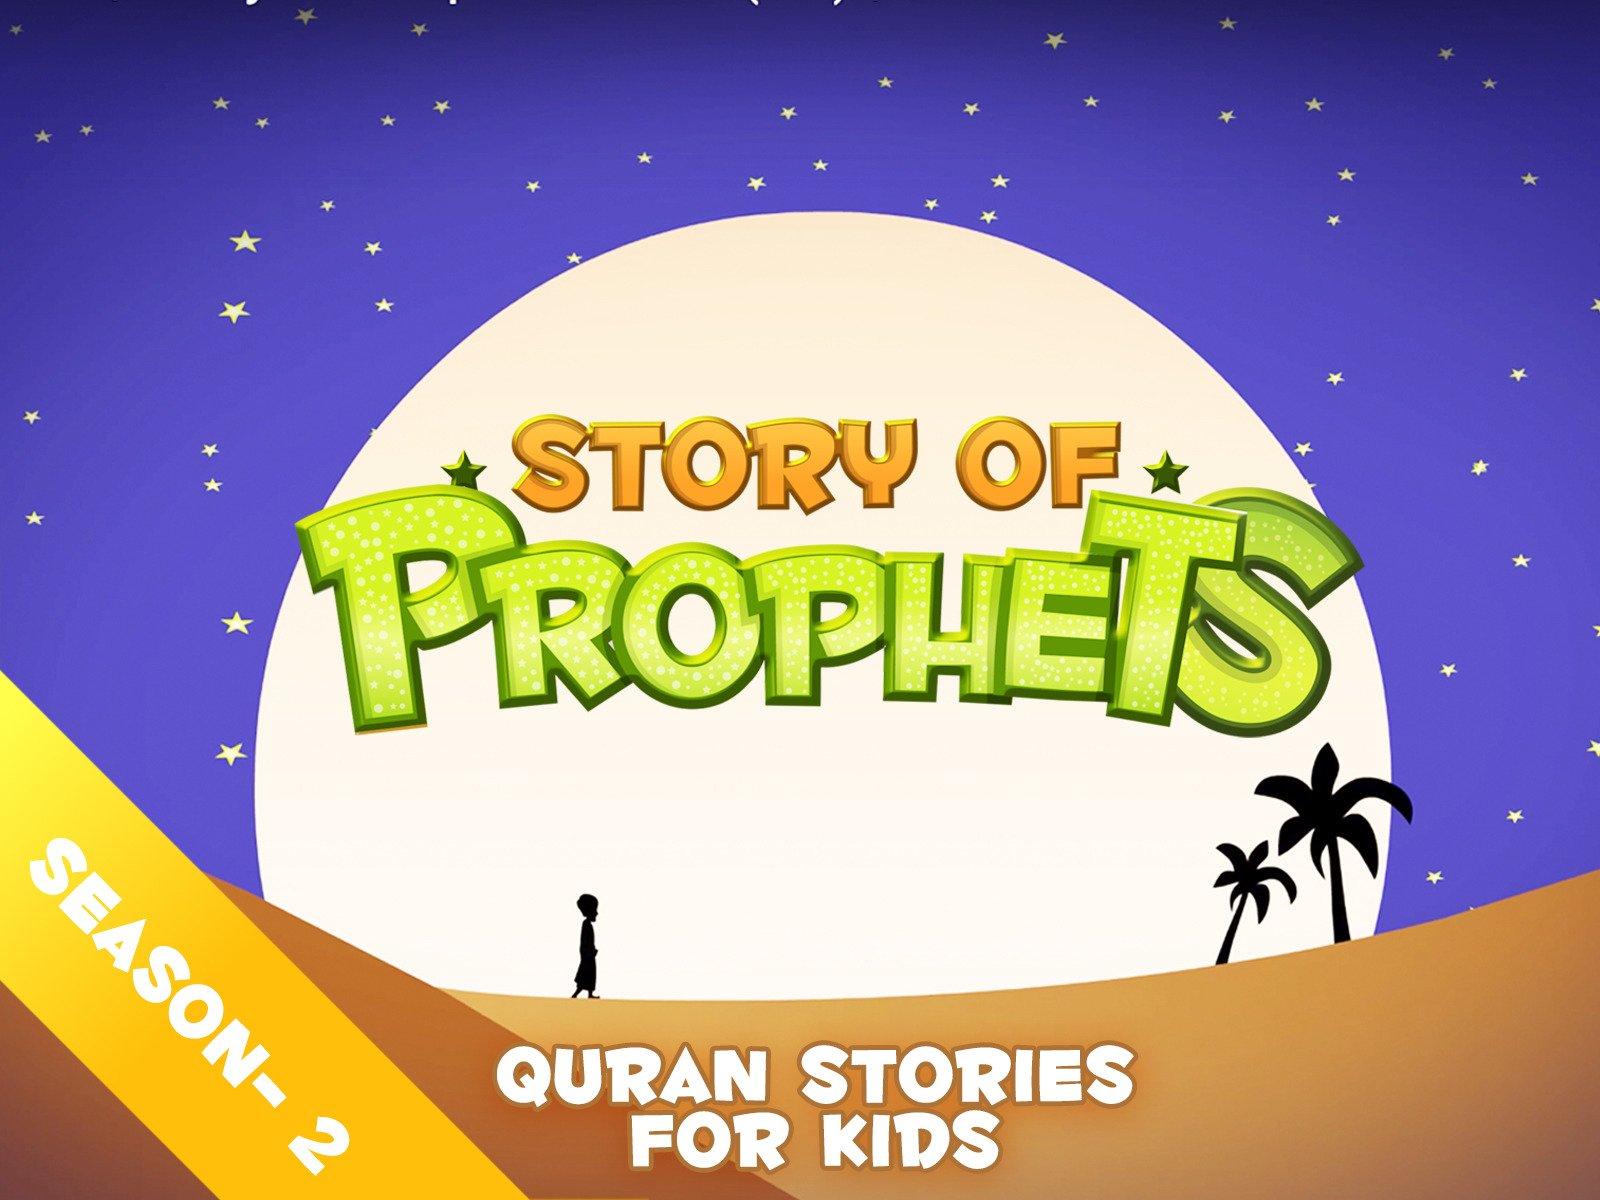 Quran Stories for Kids - Season 2